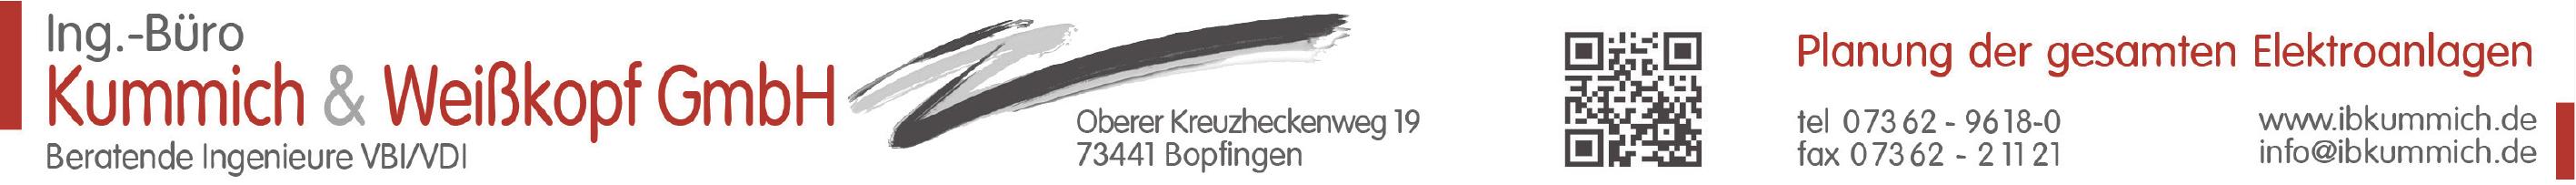 Ingenieurbüro Kummich & Weißkopf